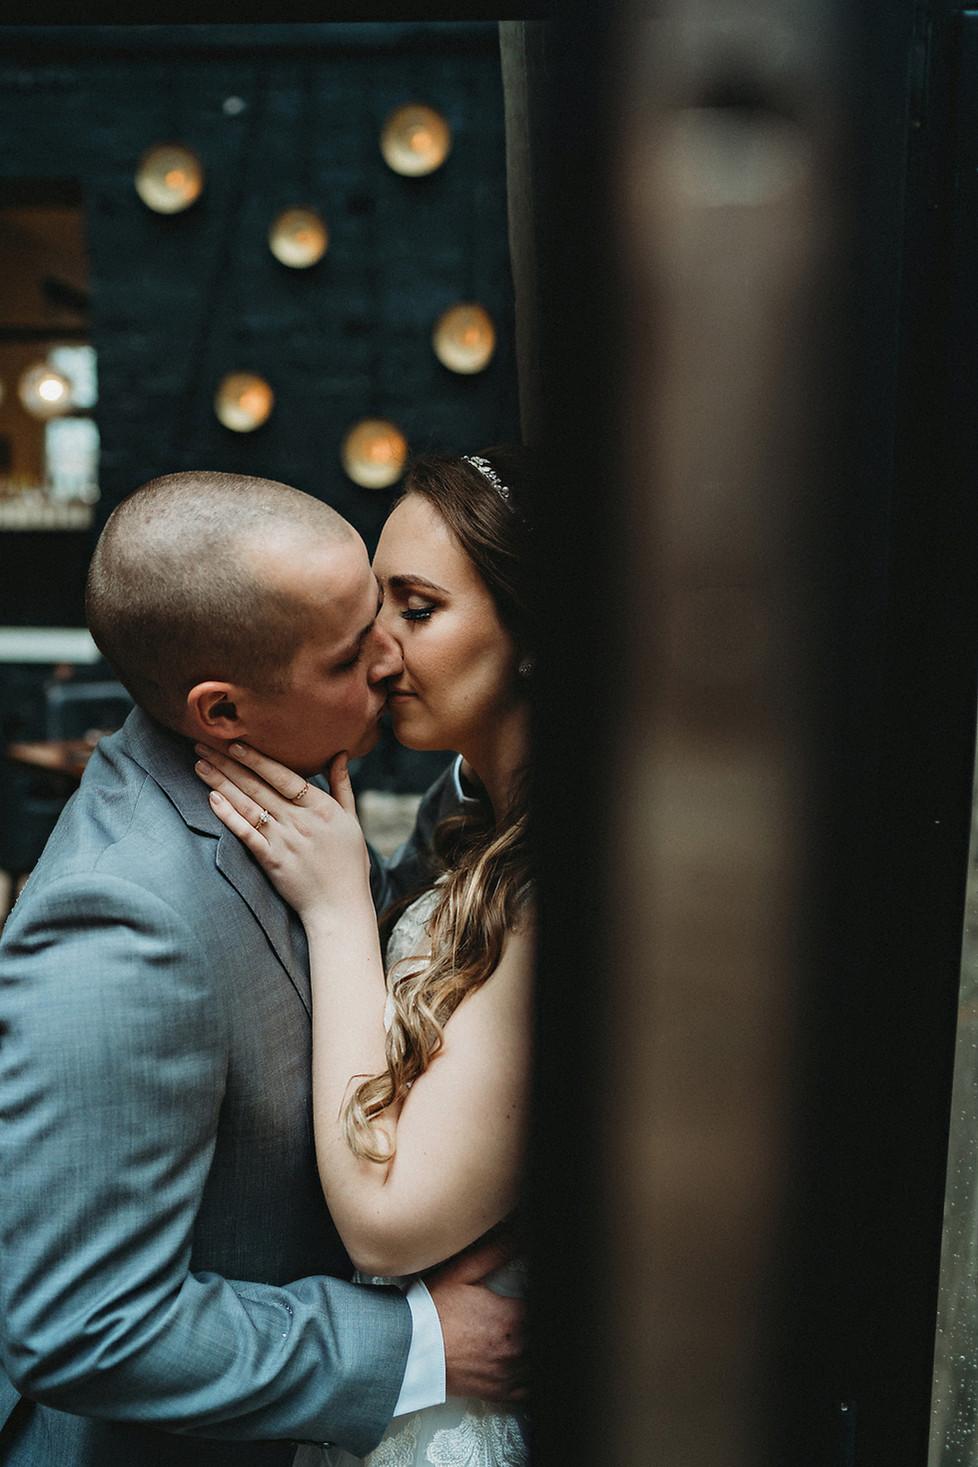 Austin + Hannah || Hotel Covington Wedding, The Madison Event Center Cincinnati, OHIO